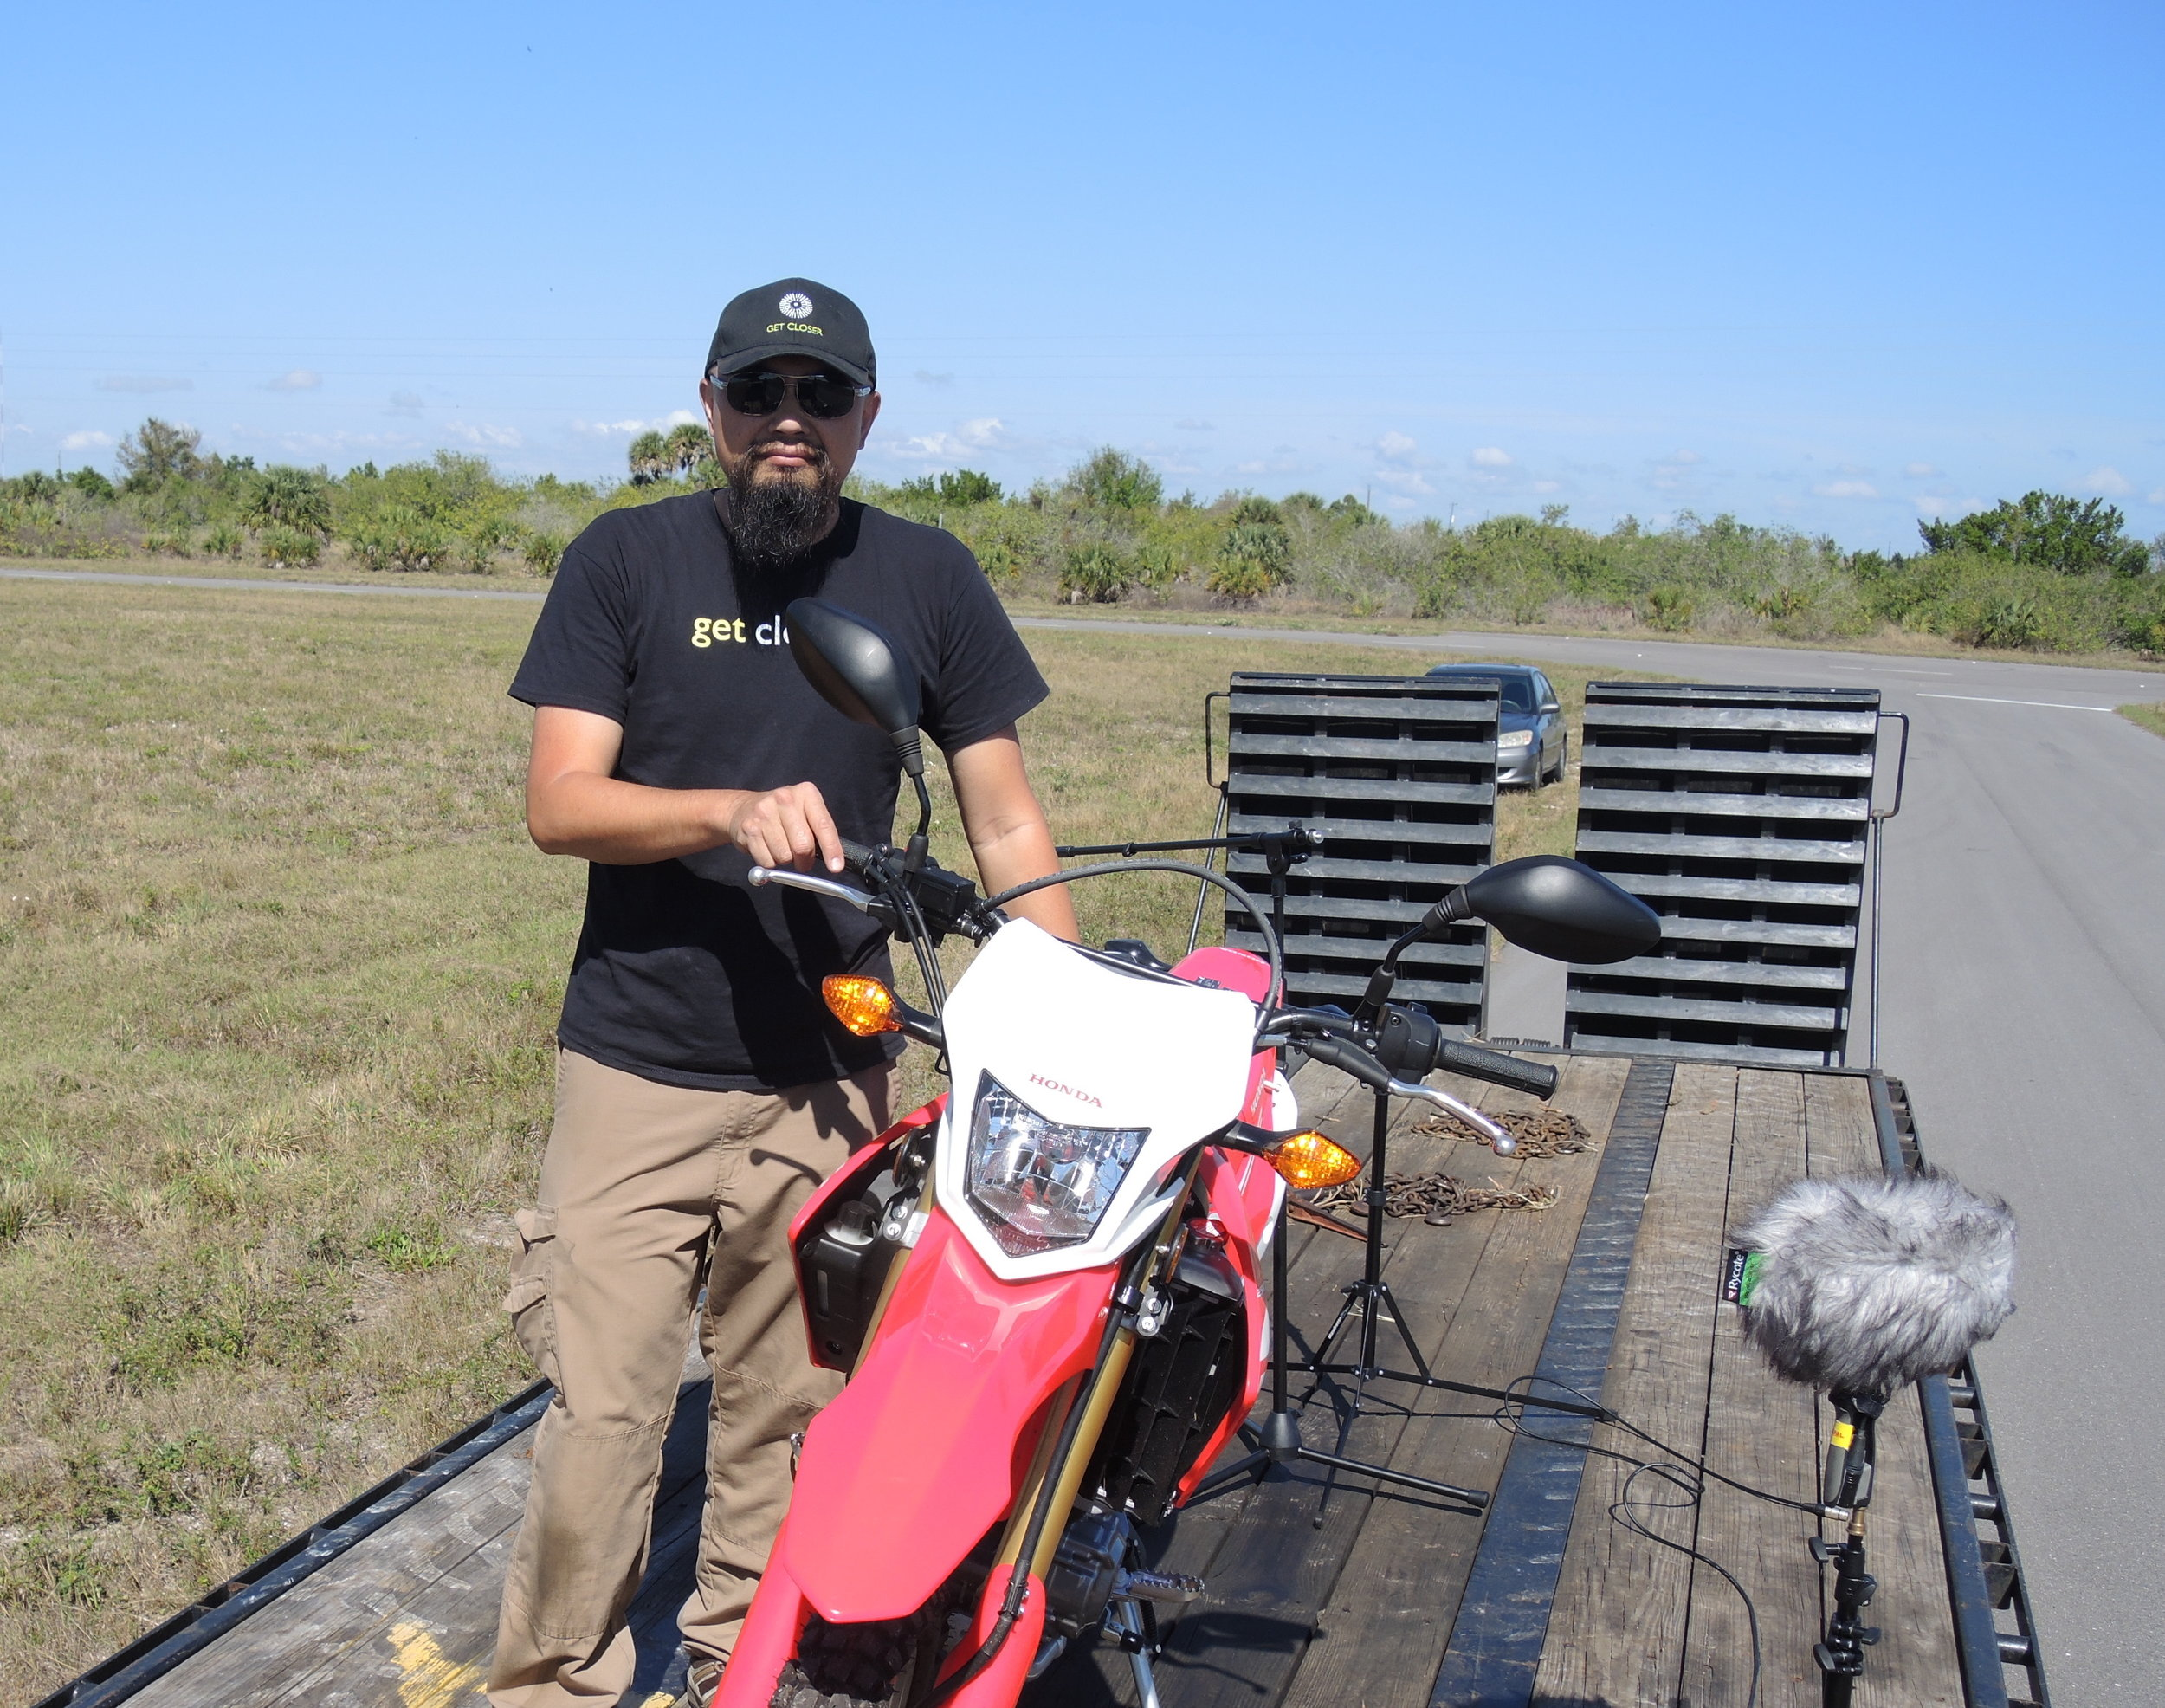 Vehicle Motorcycle DSCN2392 2017 Honda 250cc motorcycle - Watson cropped.JPG